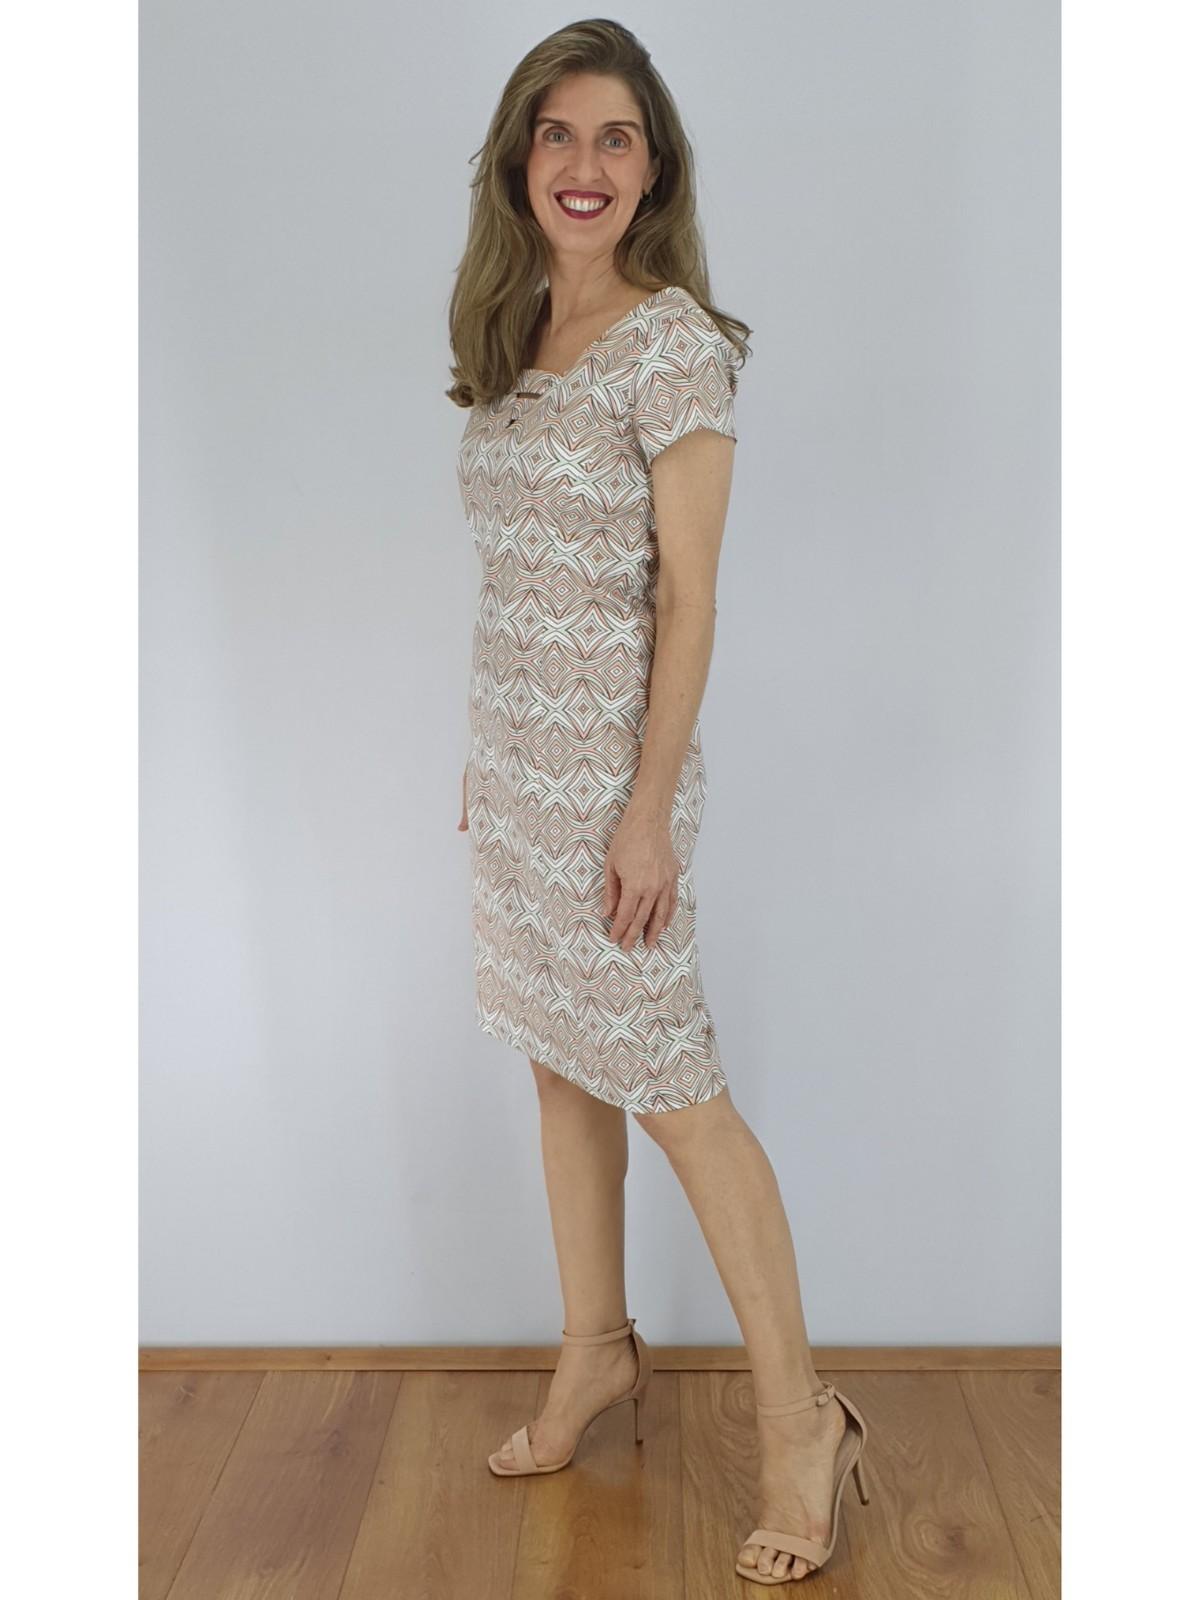 Vestido Satin Cotton Estampado em 3 Cores